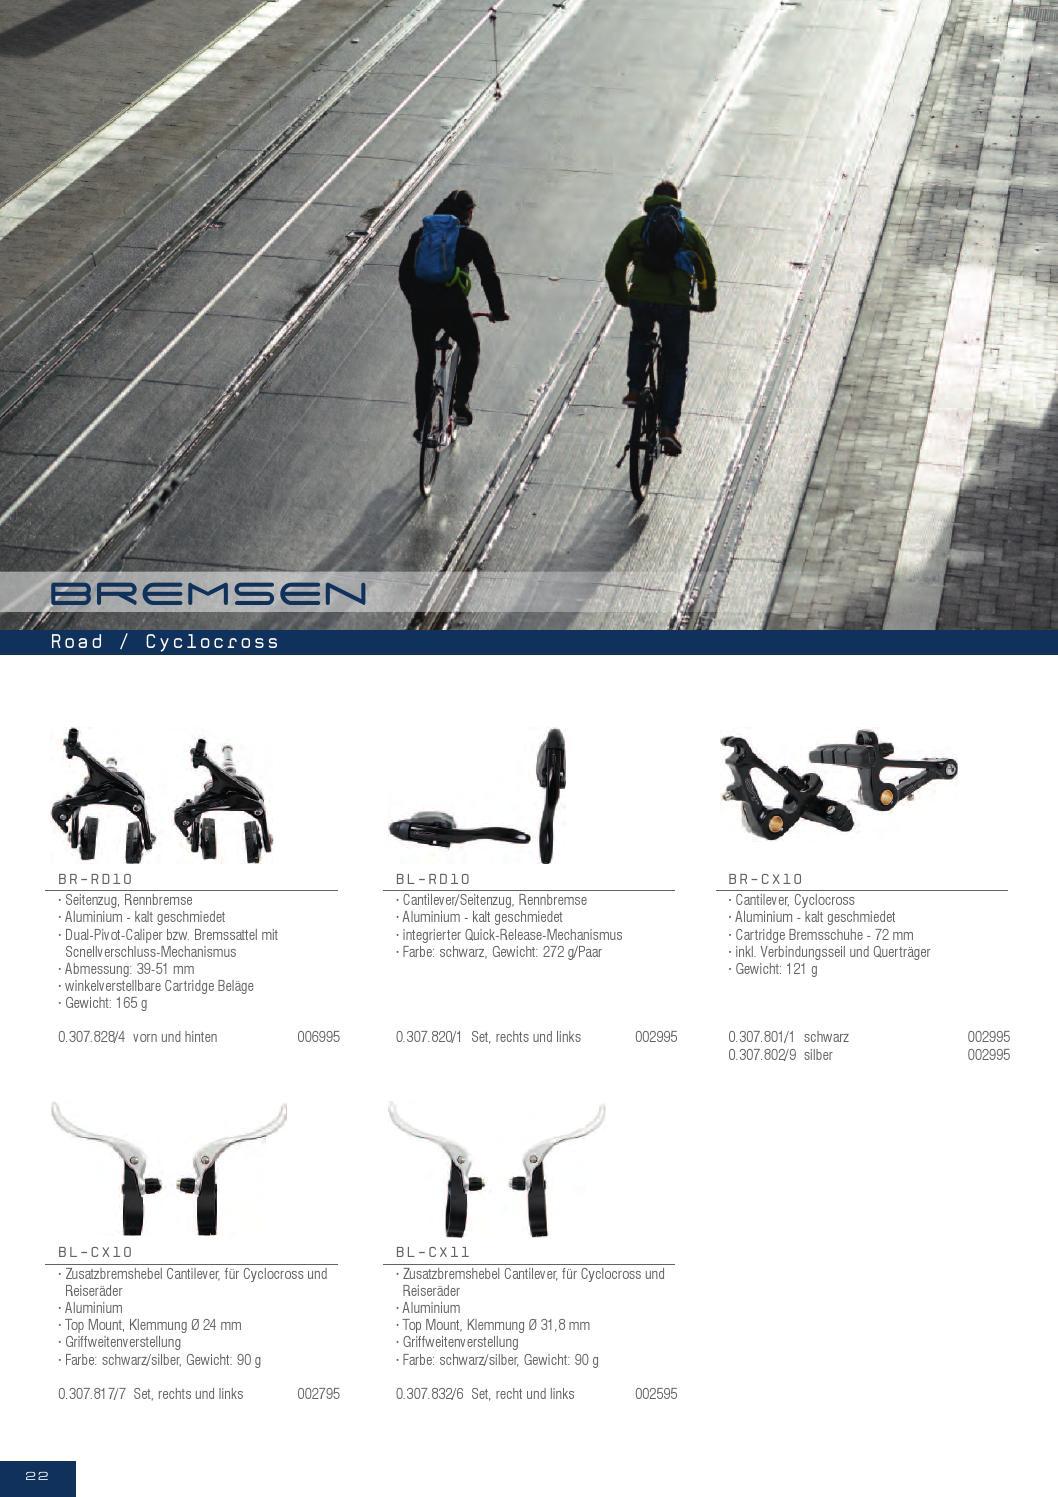 Fahrrad-Bremsscheibe CDR-1 6-Loch 160 mm 130 g Edelstahl